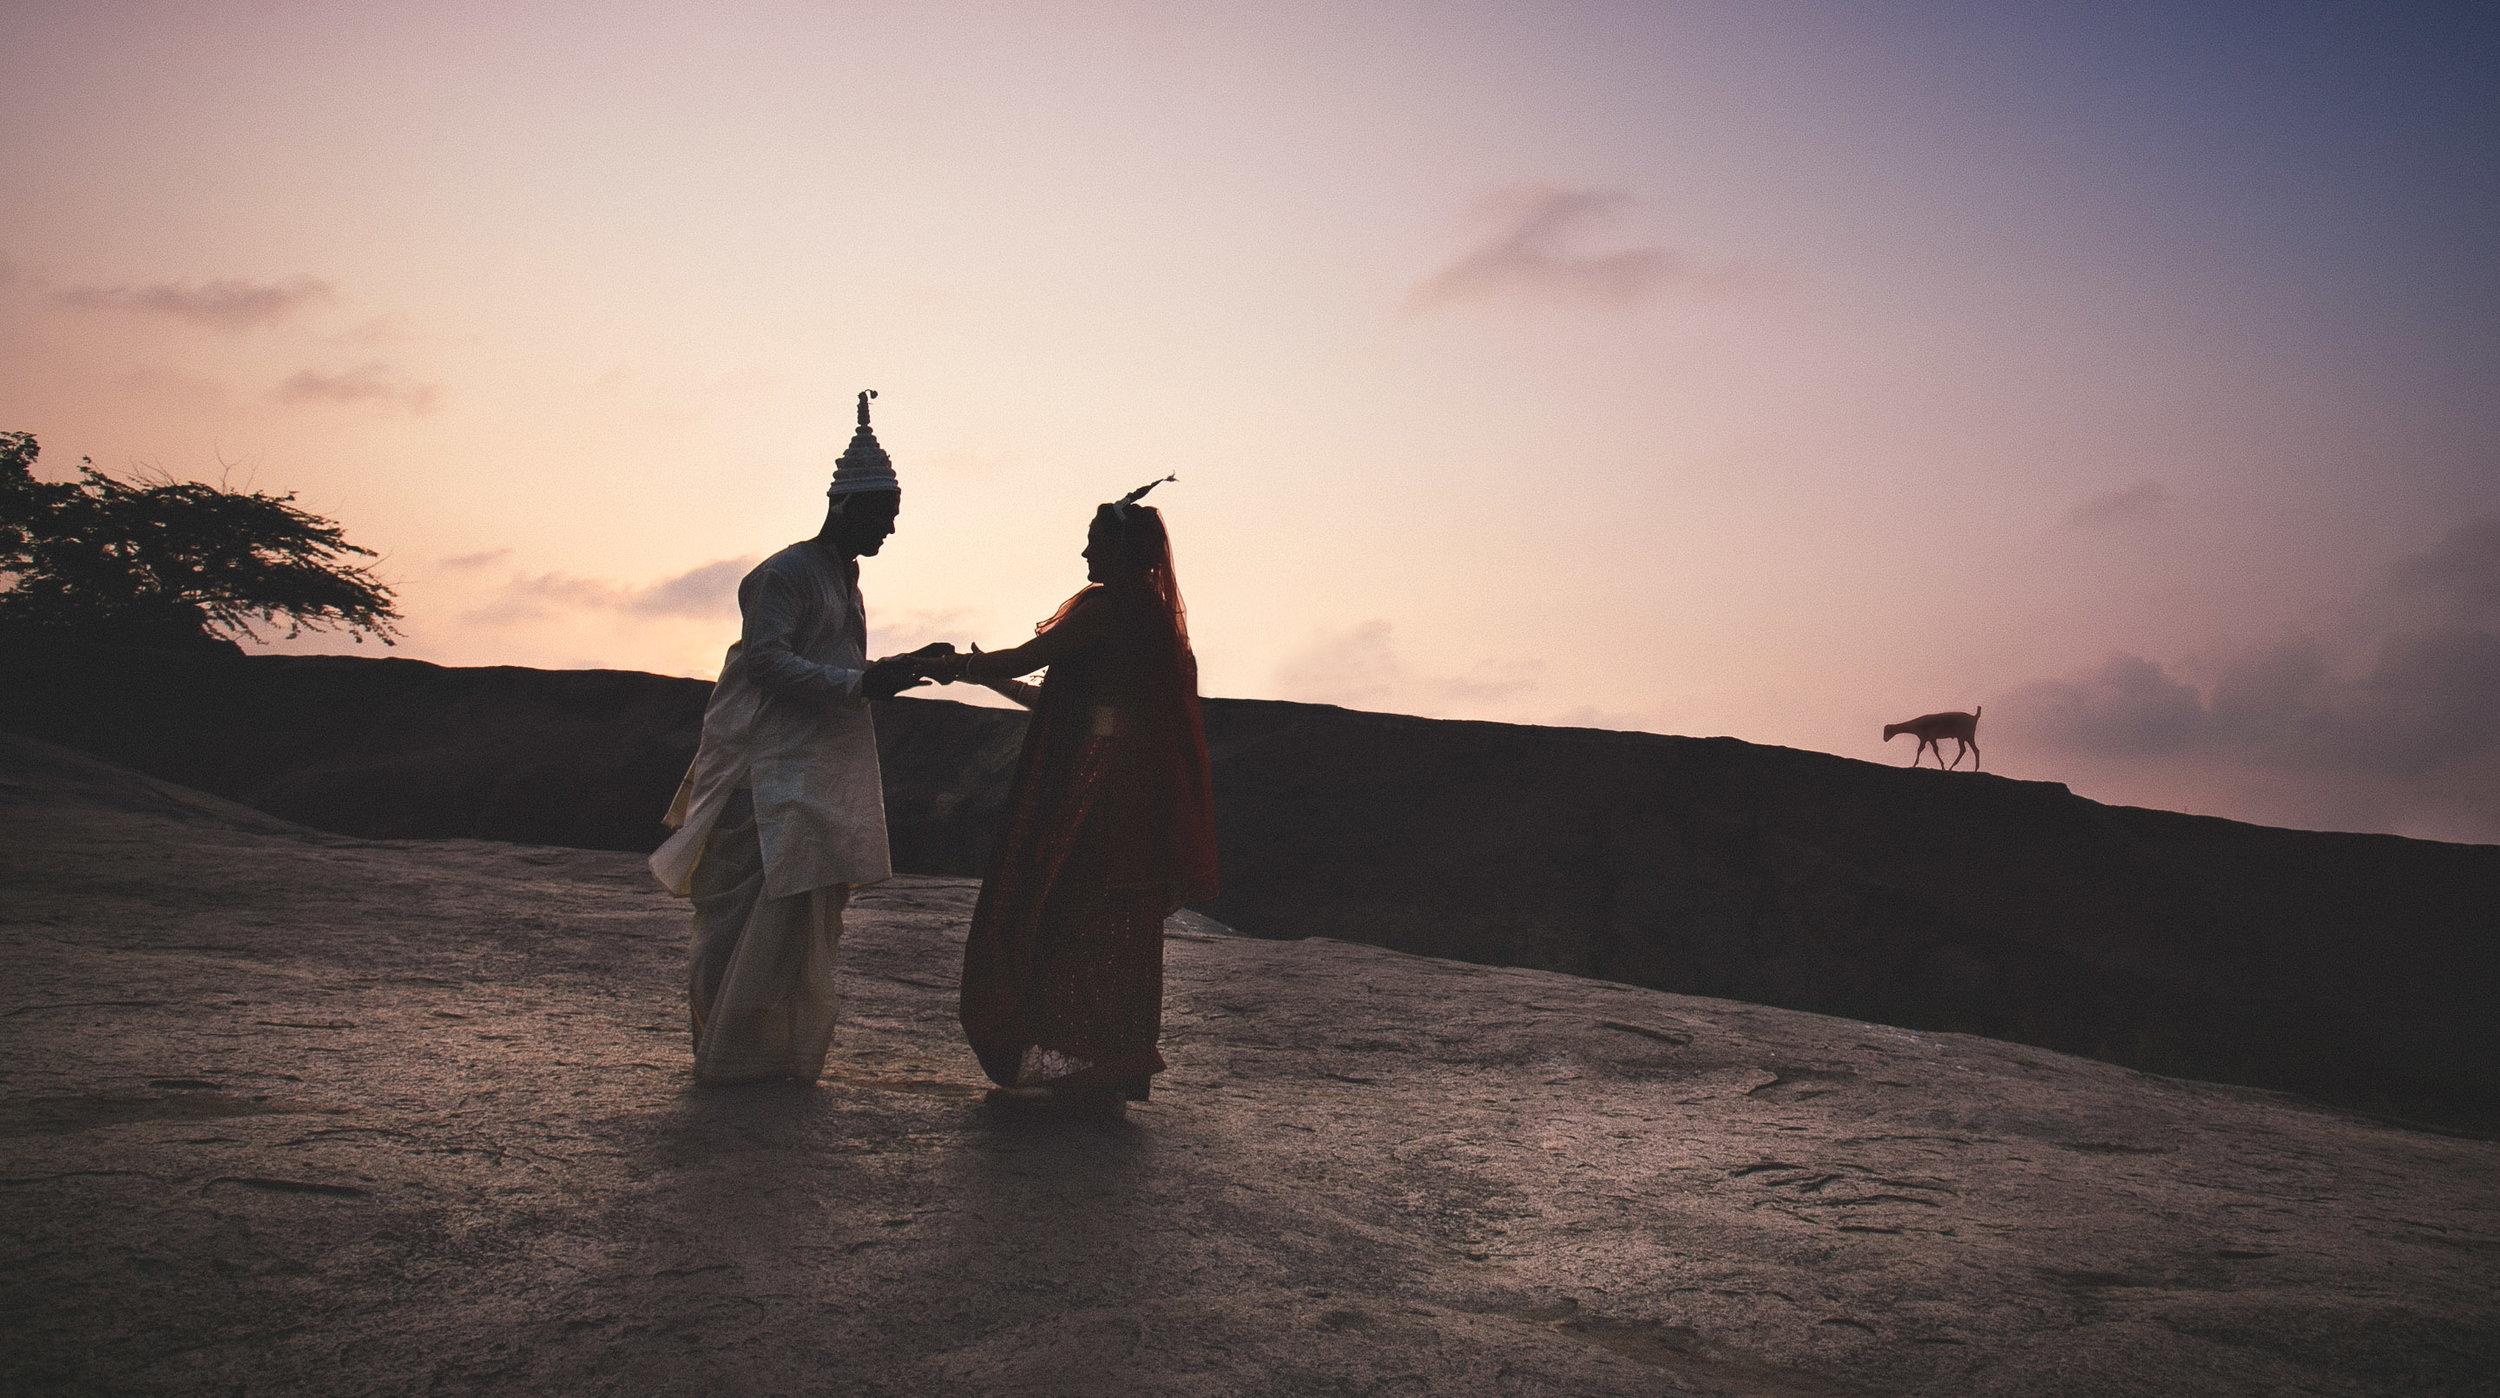 bengali-indian-wedding.jpg